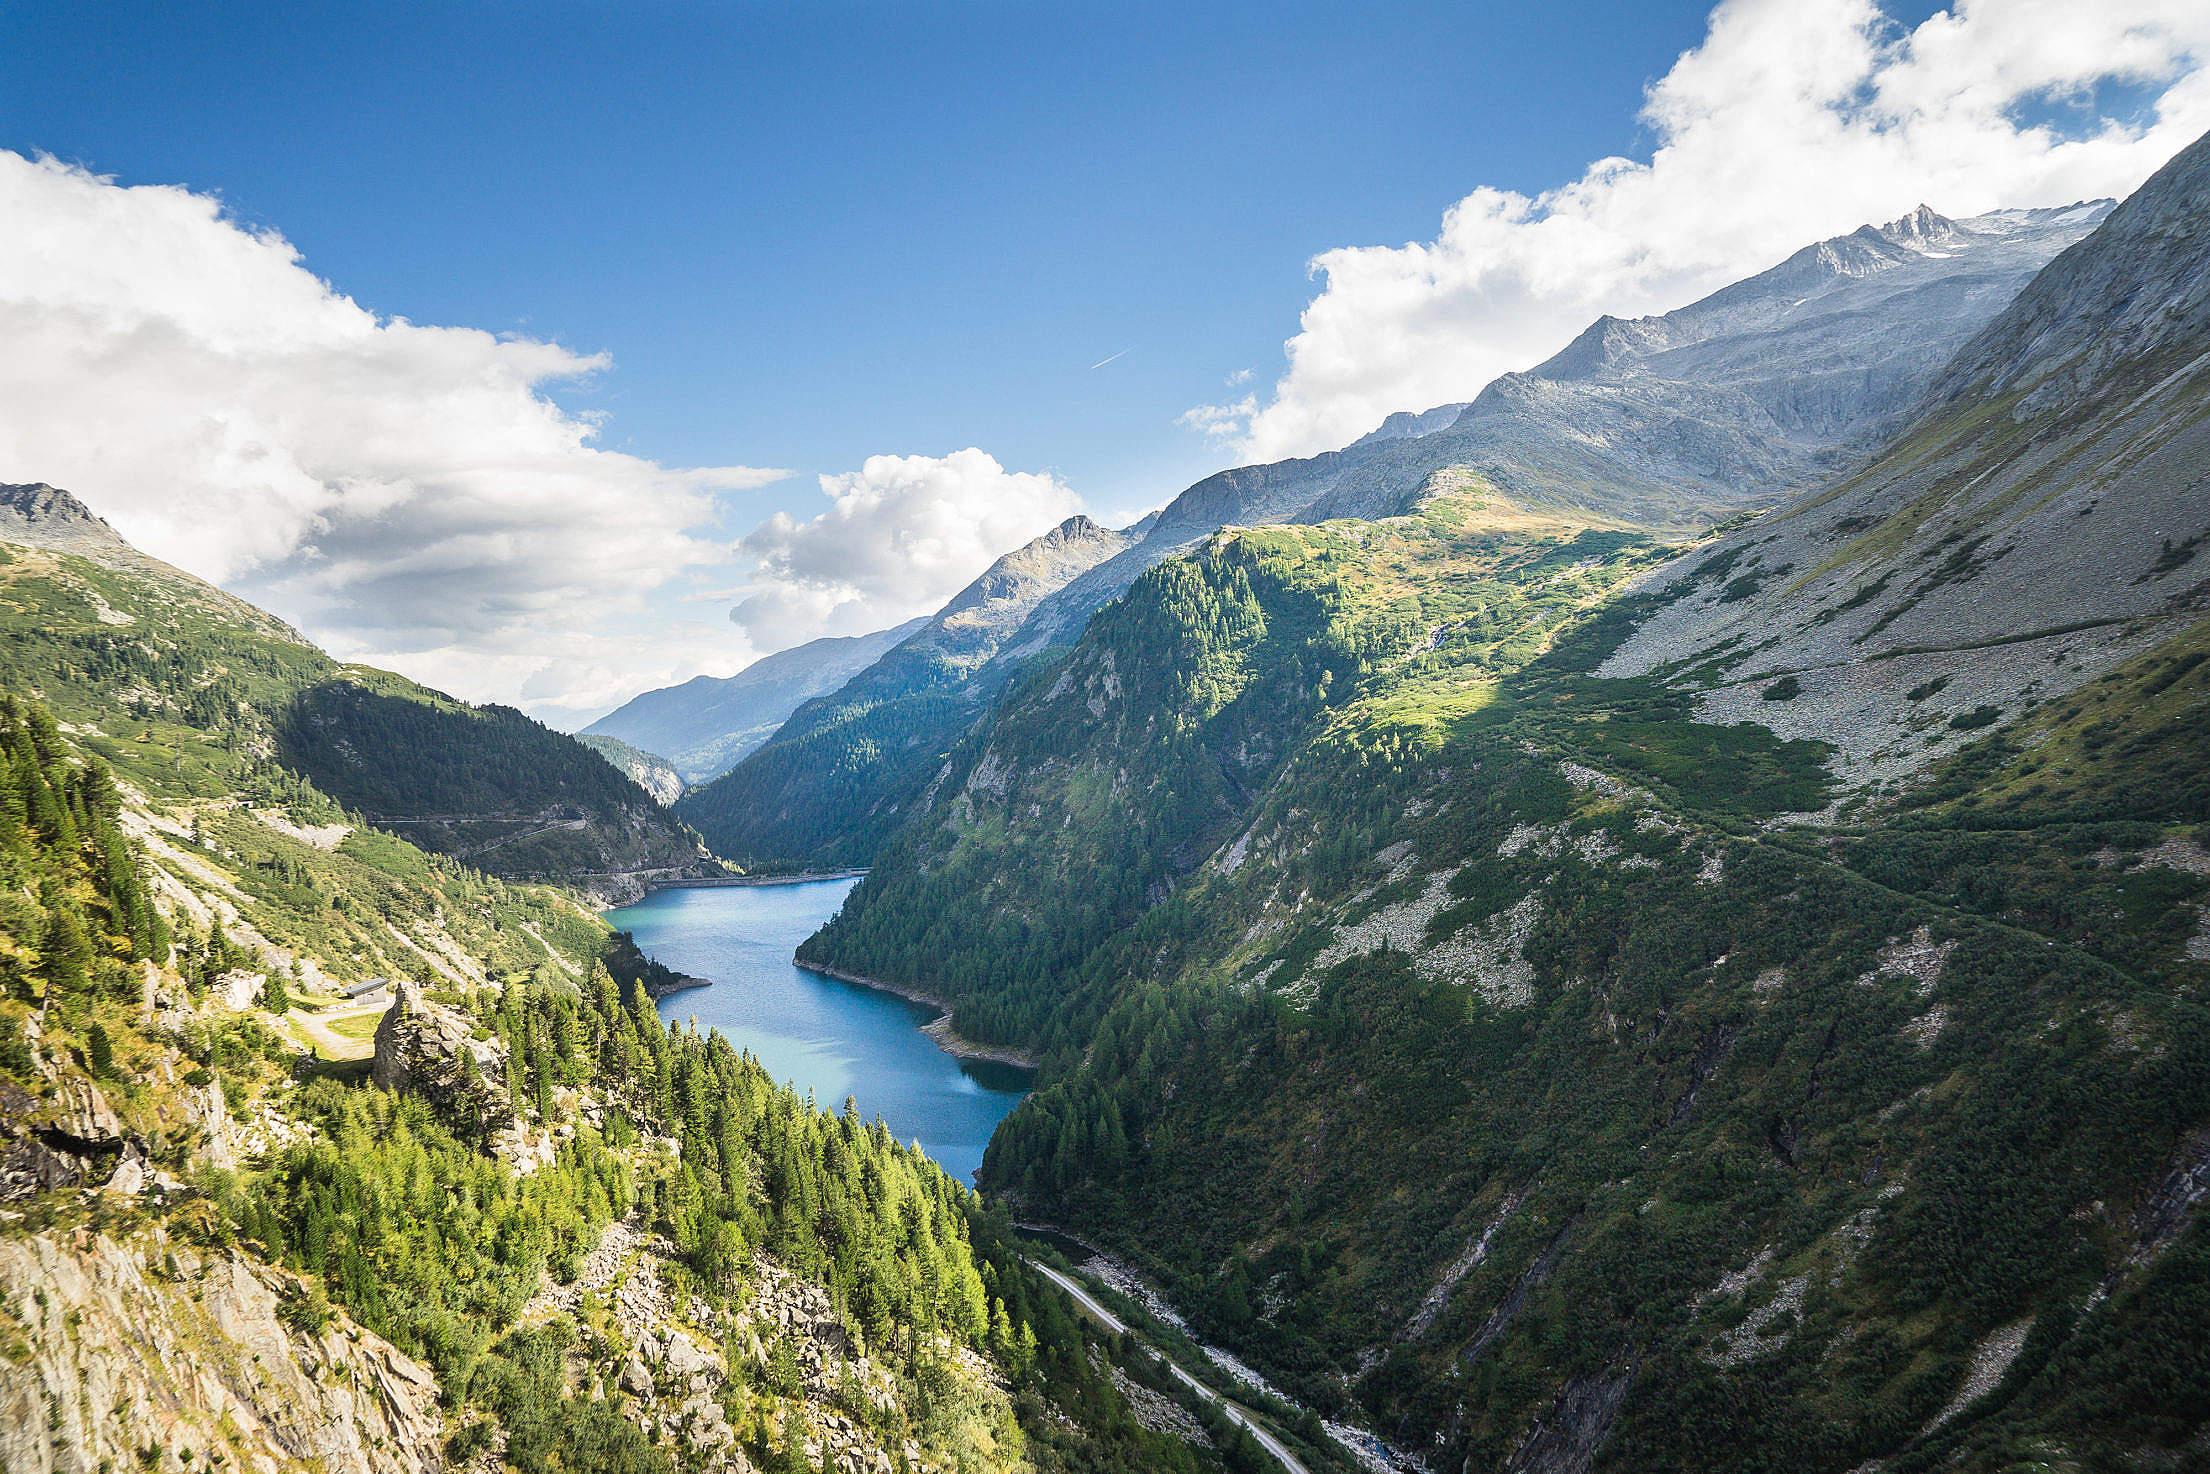 Water Reservoir Between Beautiful Mountains Free Stock Photo